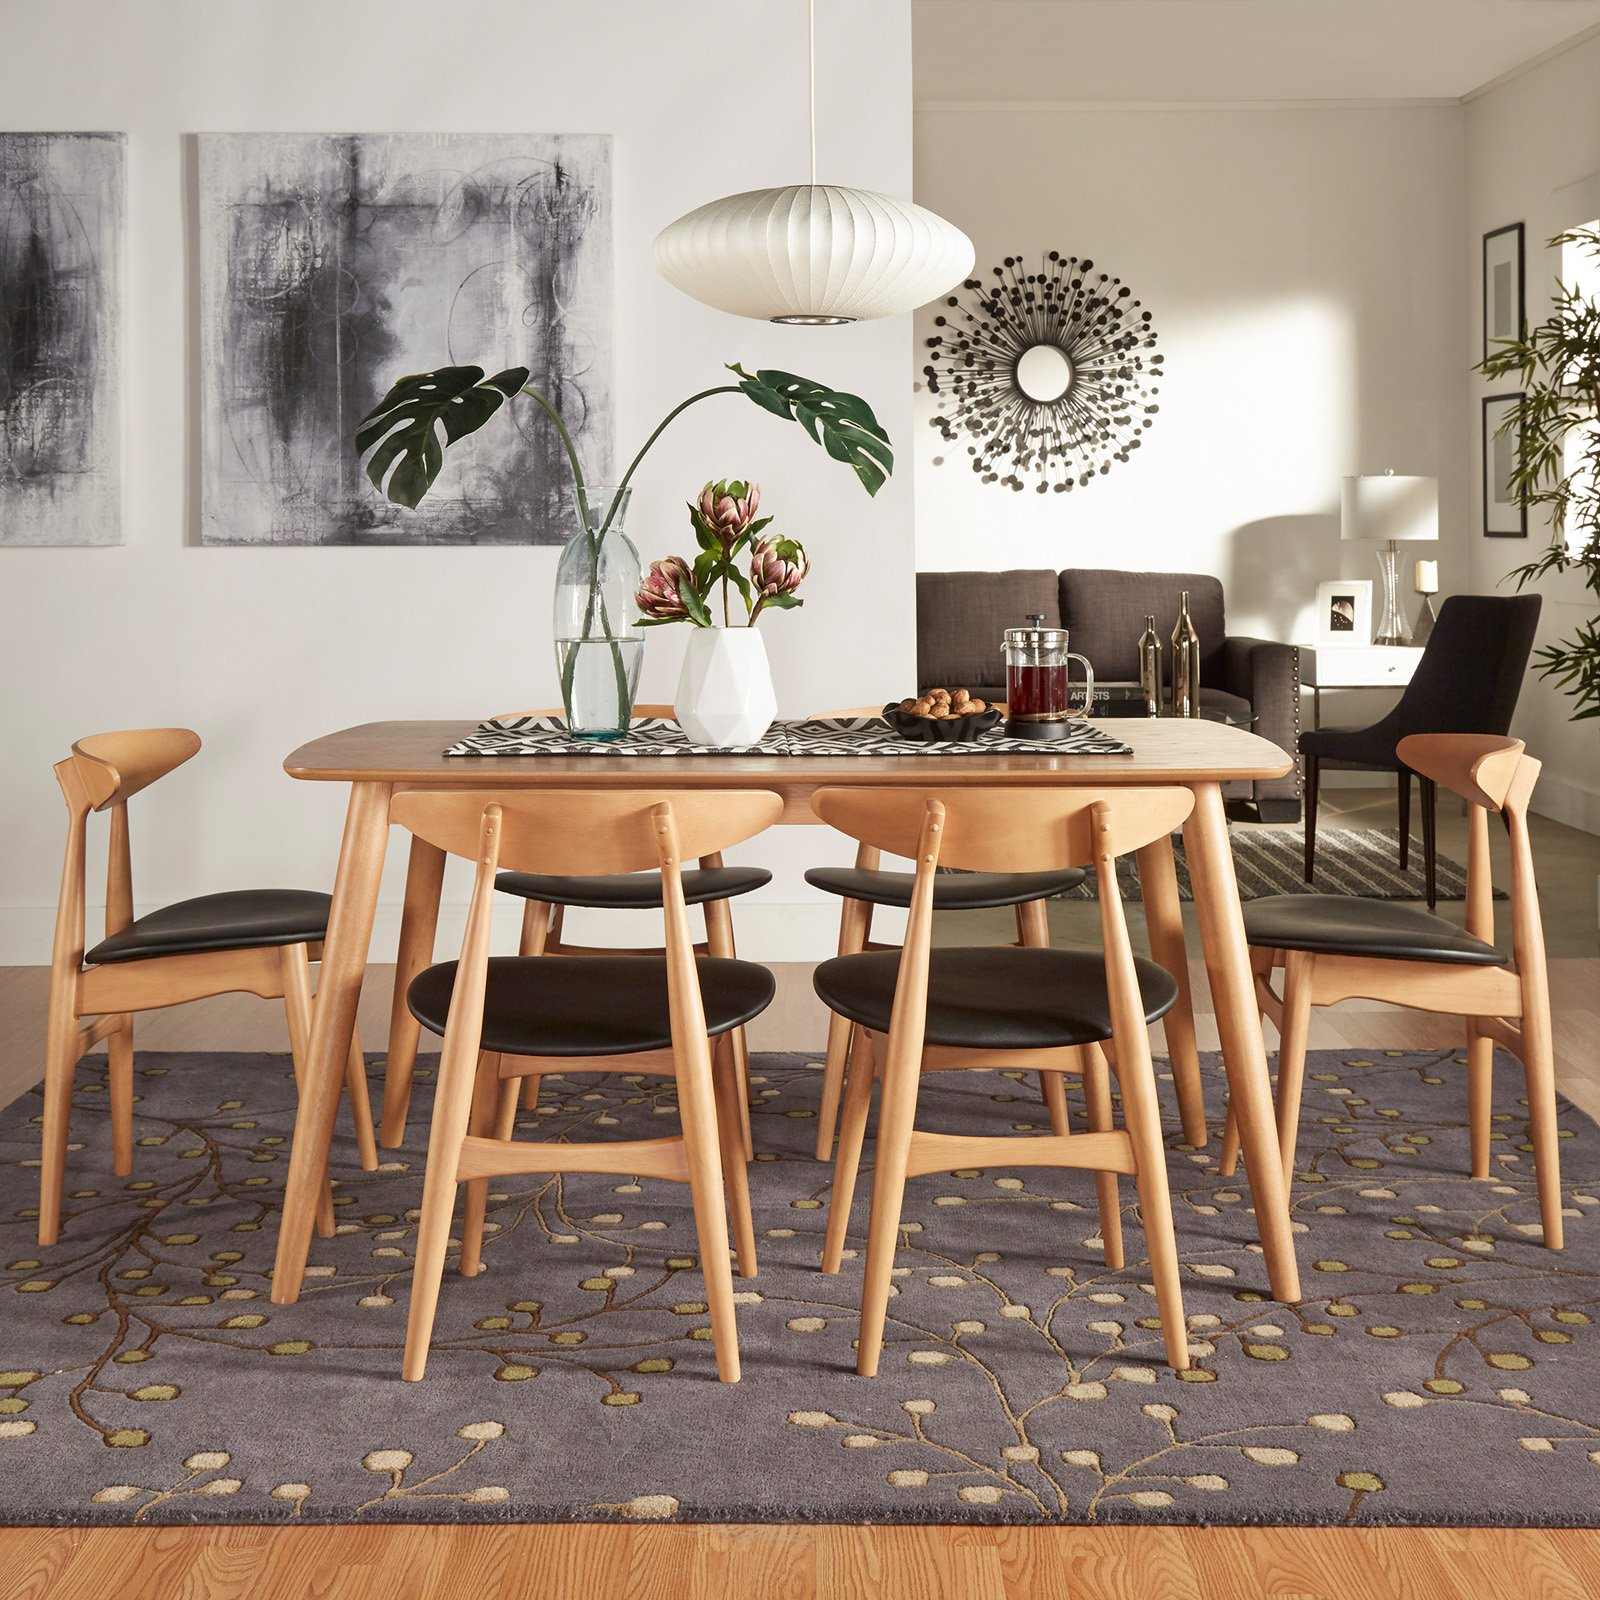 Mid Century Dining Set: Chelsea Lane Mid Century Modern 7 Piece Dining Set With